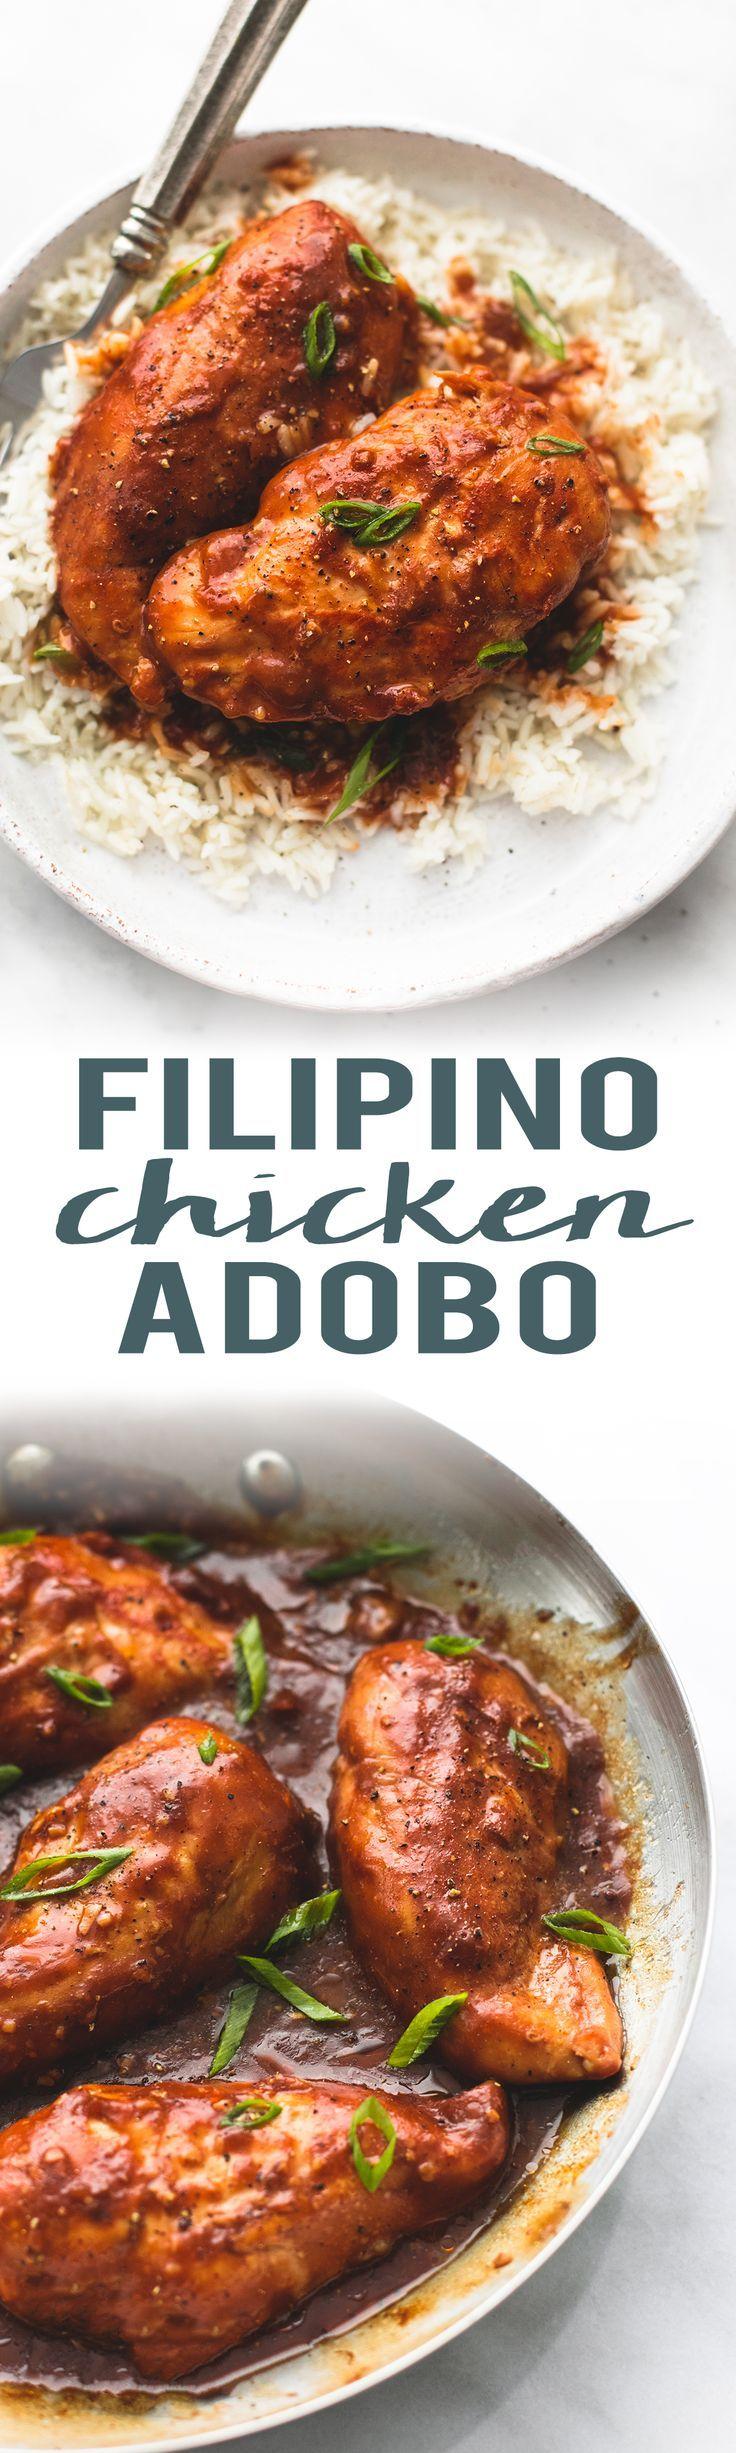 Easy homemade Filipino Chicken Adobo | http://lecremedelacrumb.com